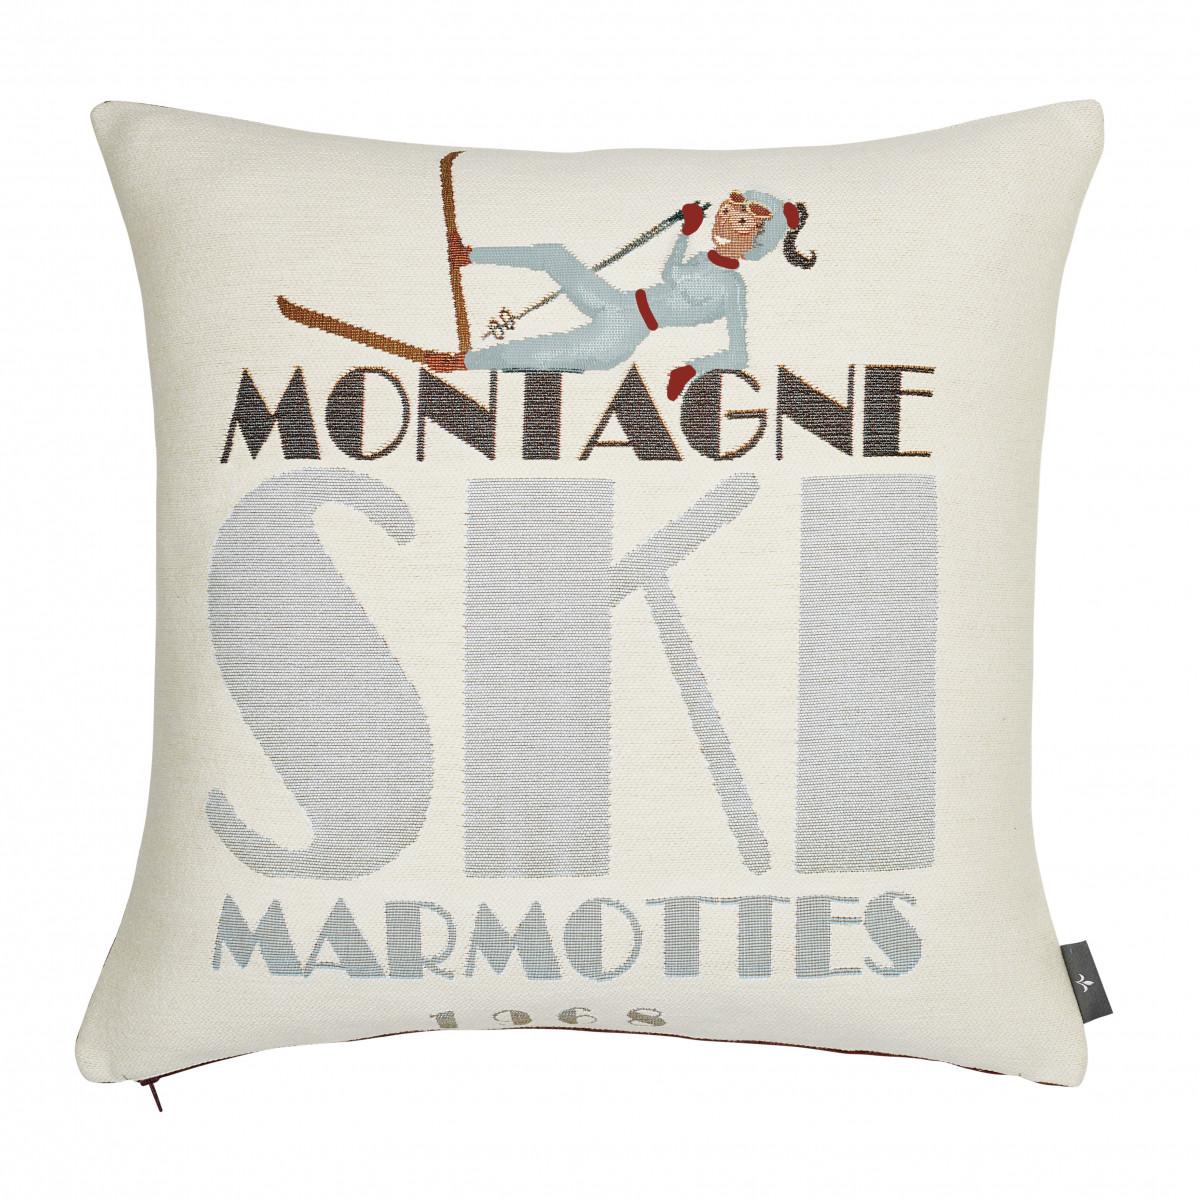 Coussin tapisserie chute de ski made in france blanc   50x50